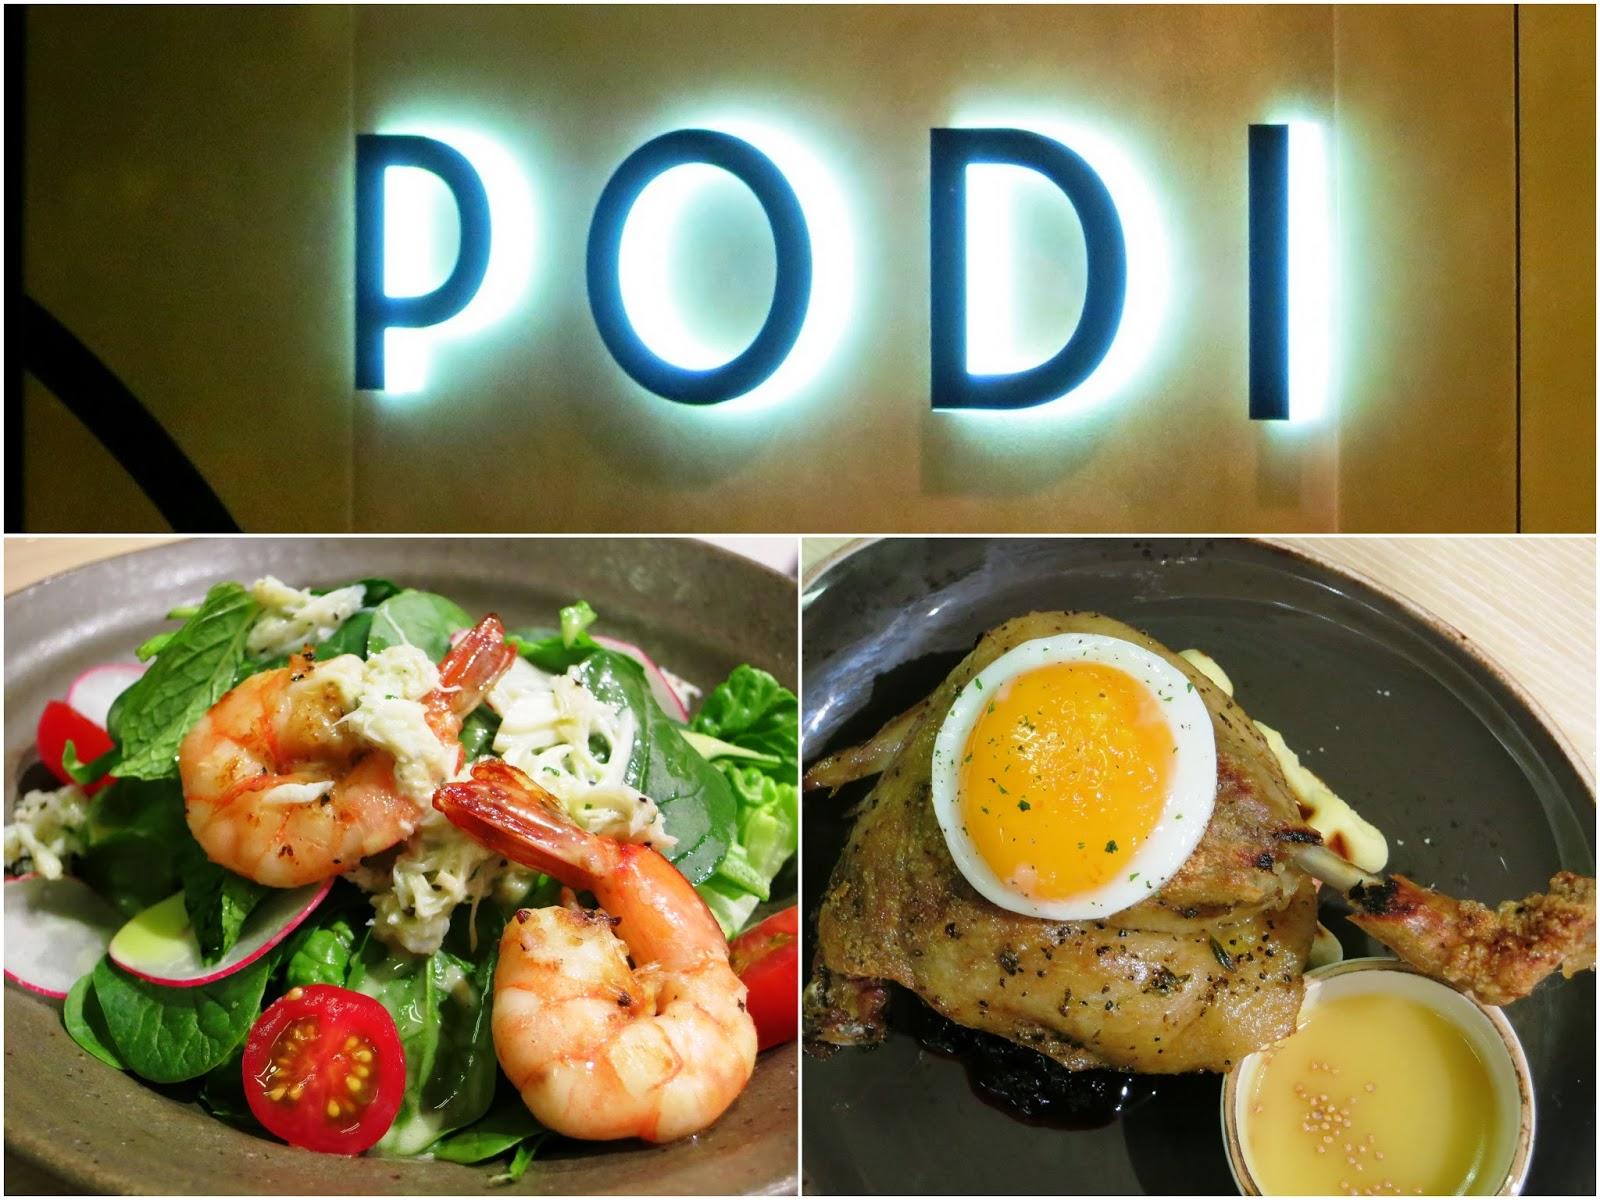 Podi A New All Day Breakfast Grill Restaurant At Raffles City Ping Centre